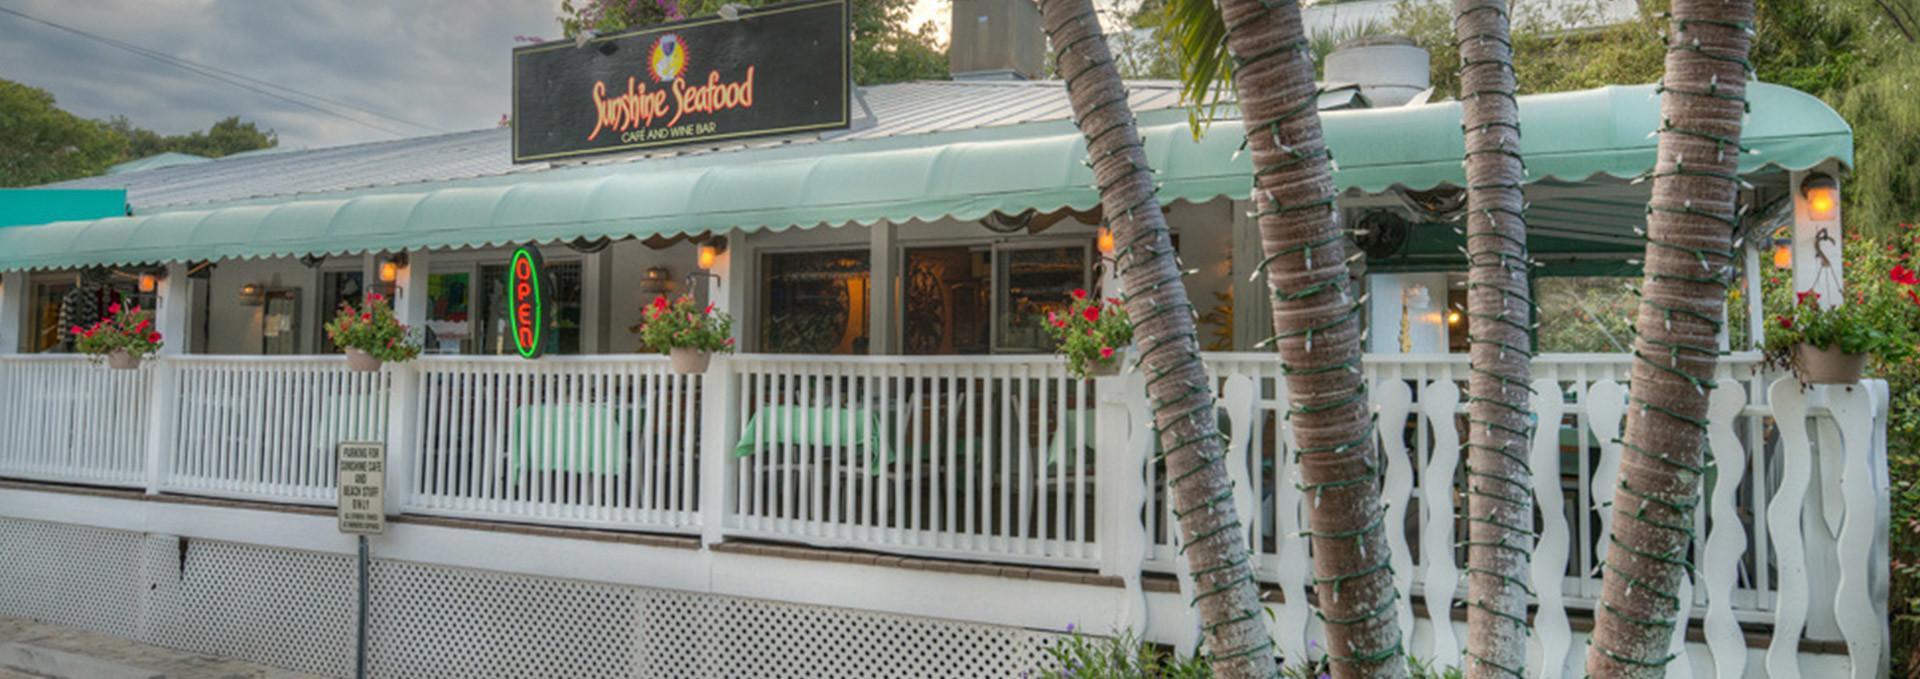 Captiva-Restaurant-Sunshine-Seafood